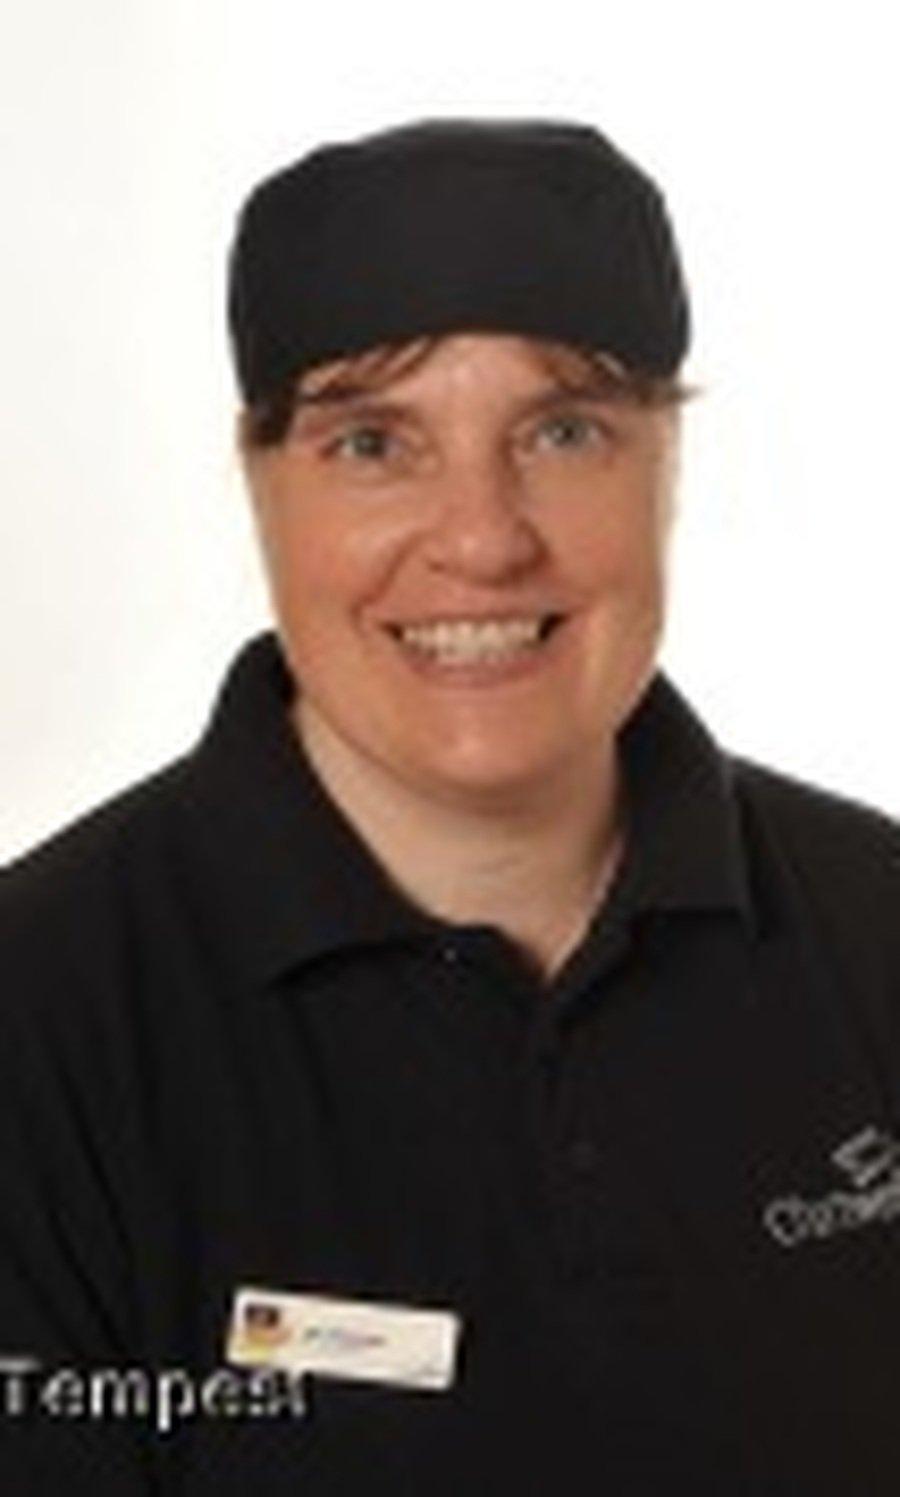 Ms V. Crawford